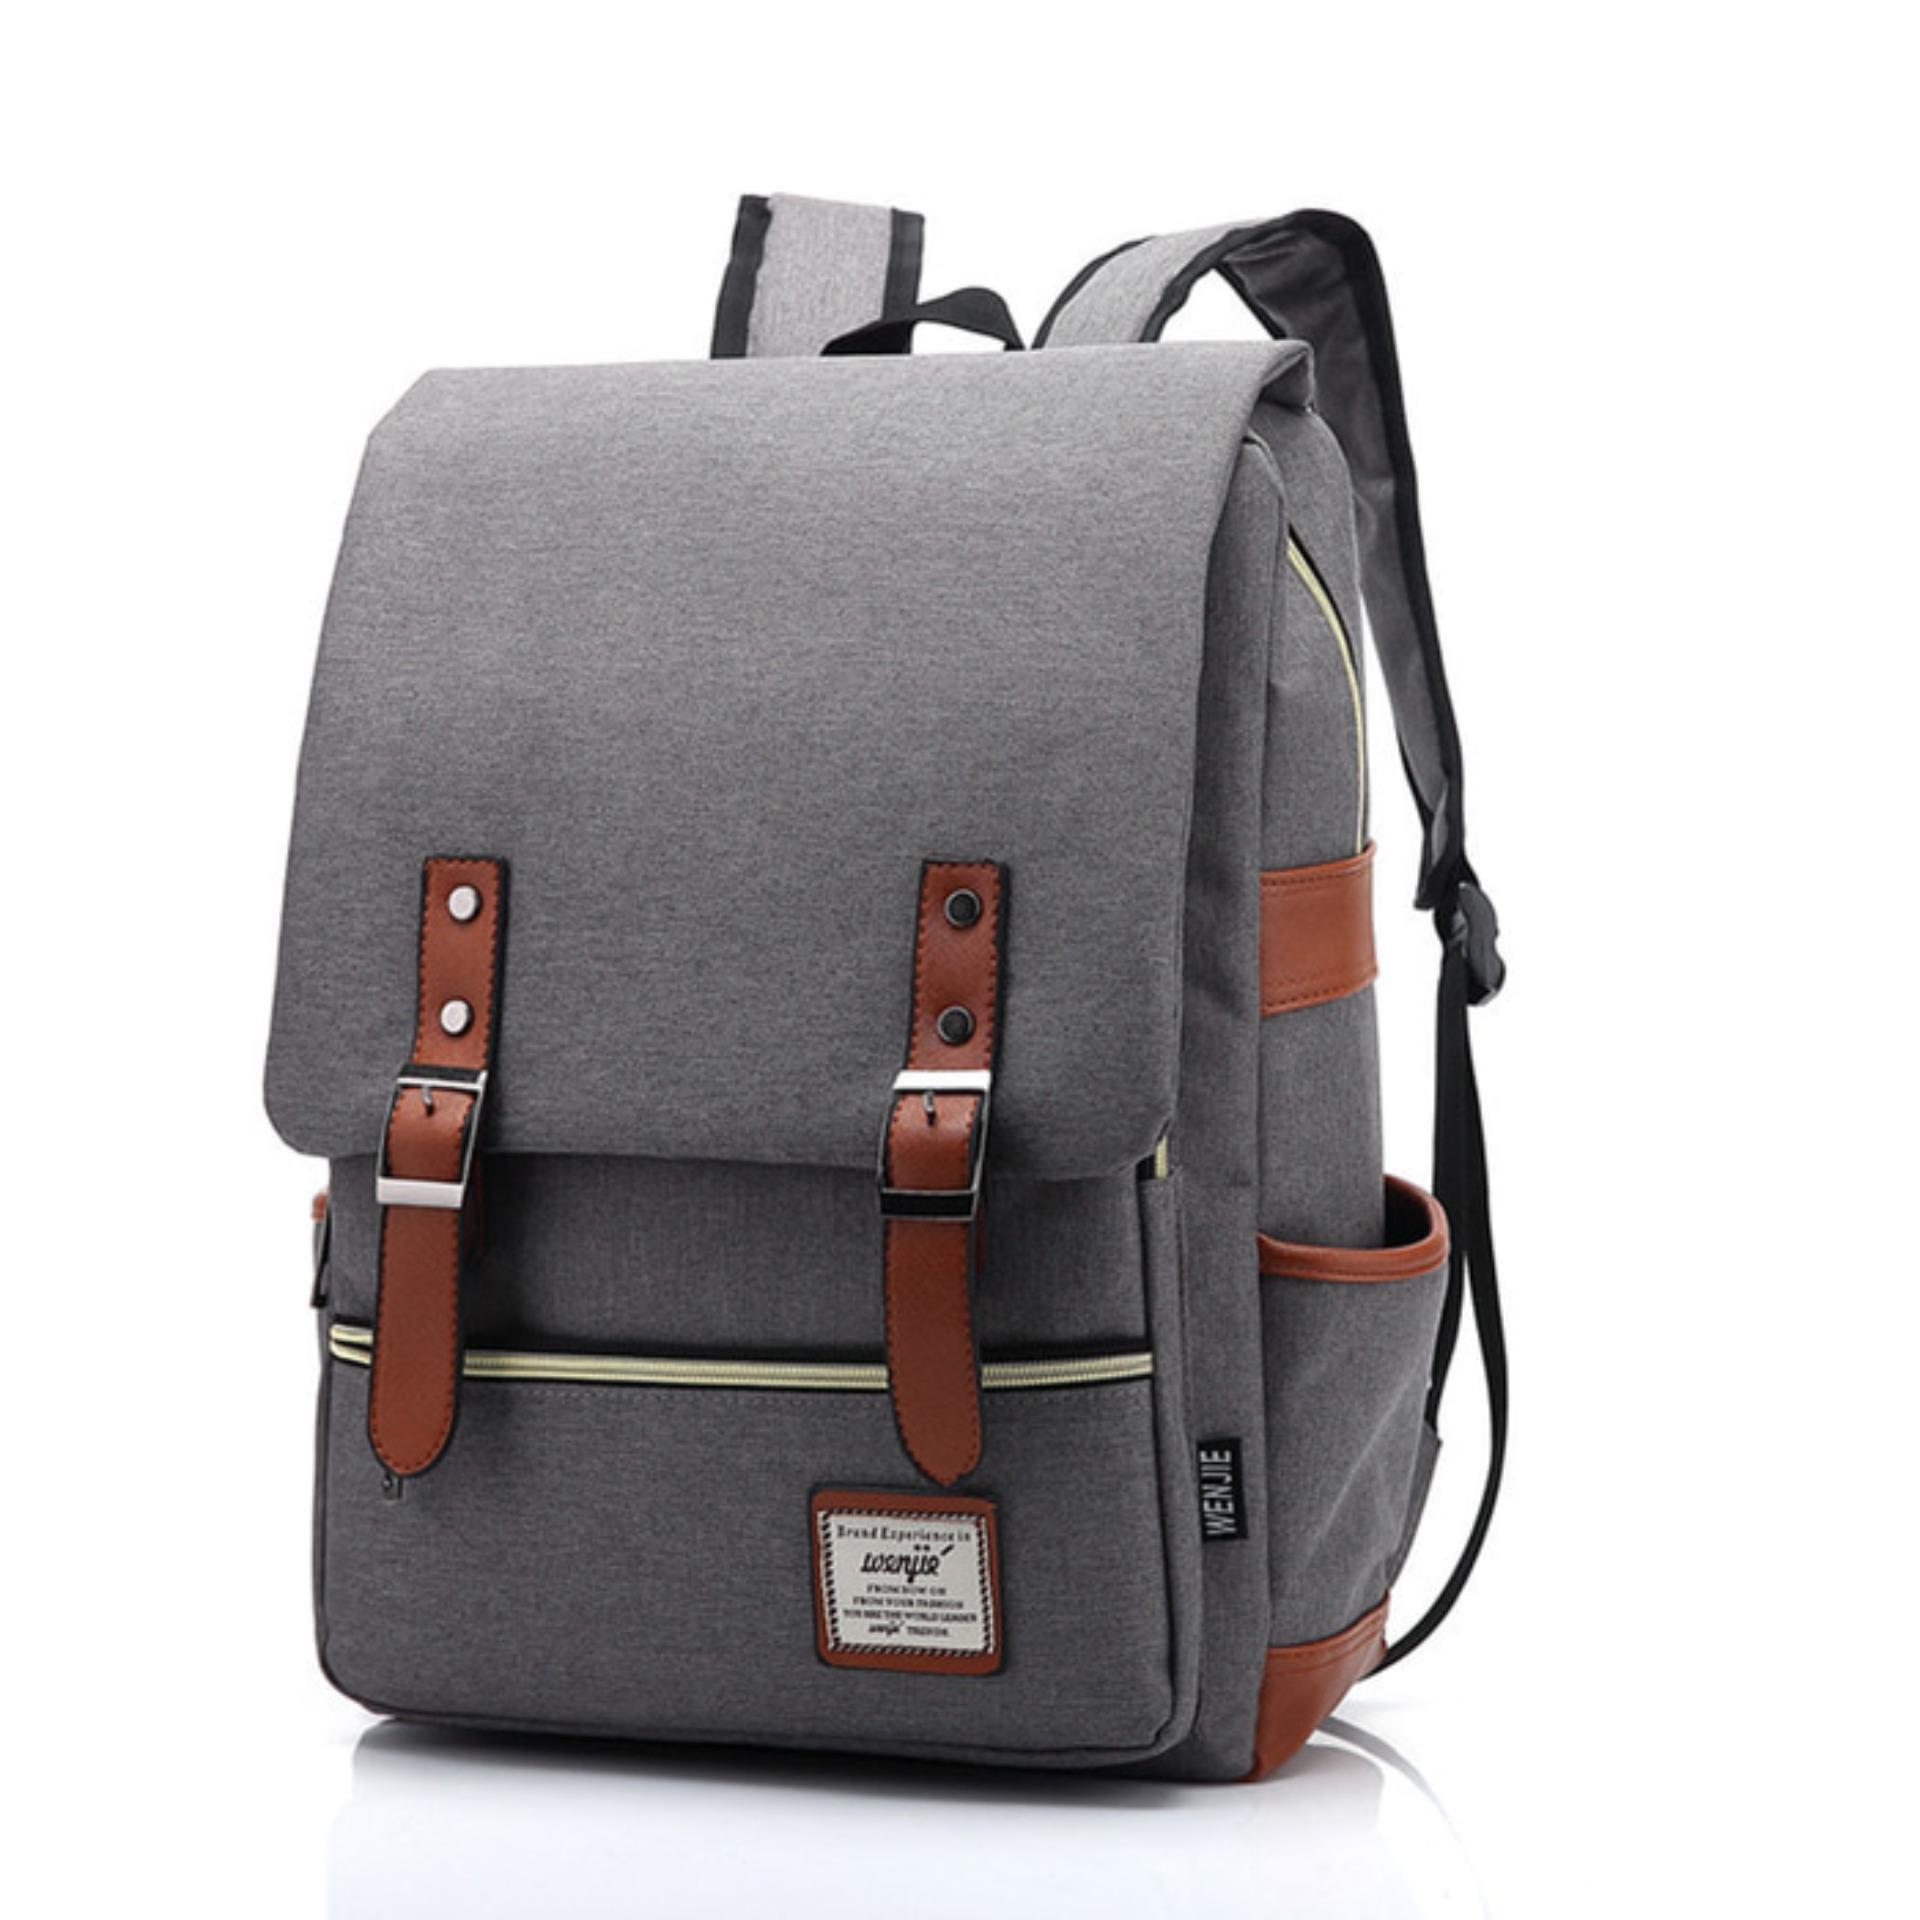 Korean Style Backpack / Tas Ransel / Tas Sekolah Kuliah Kerja Travel